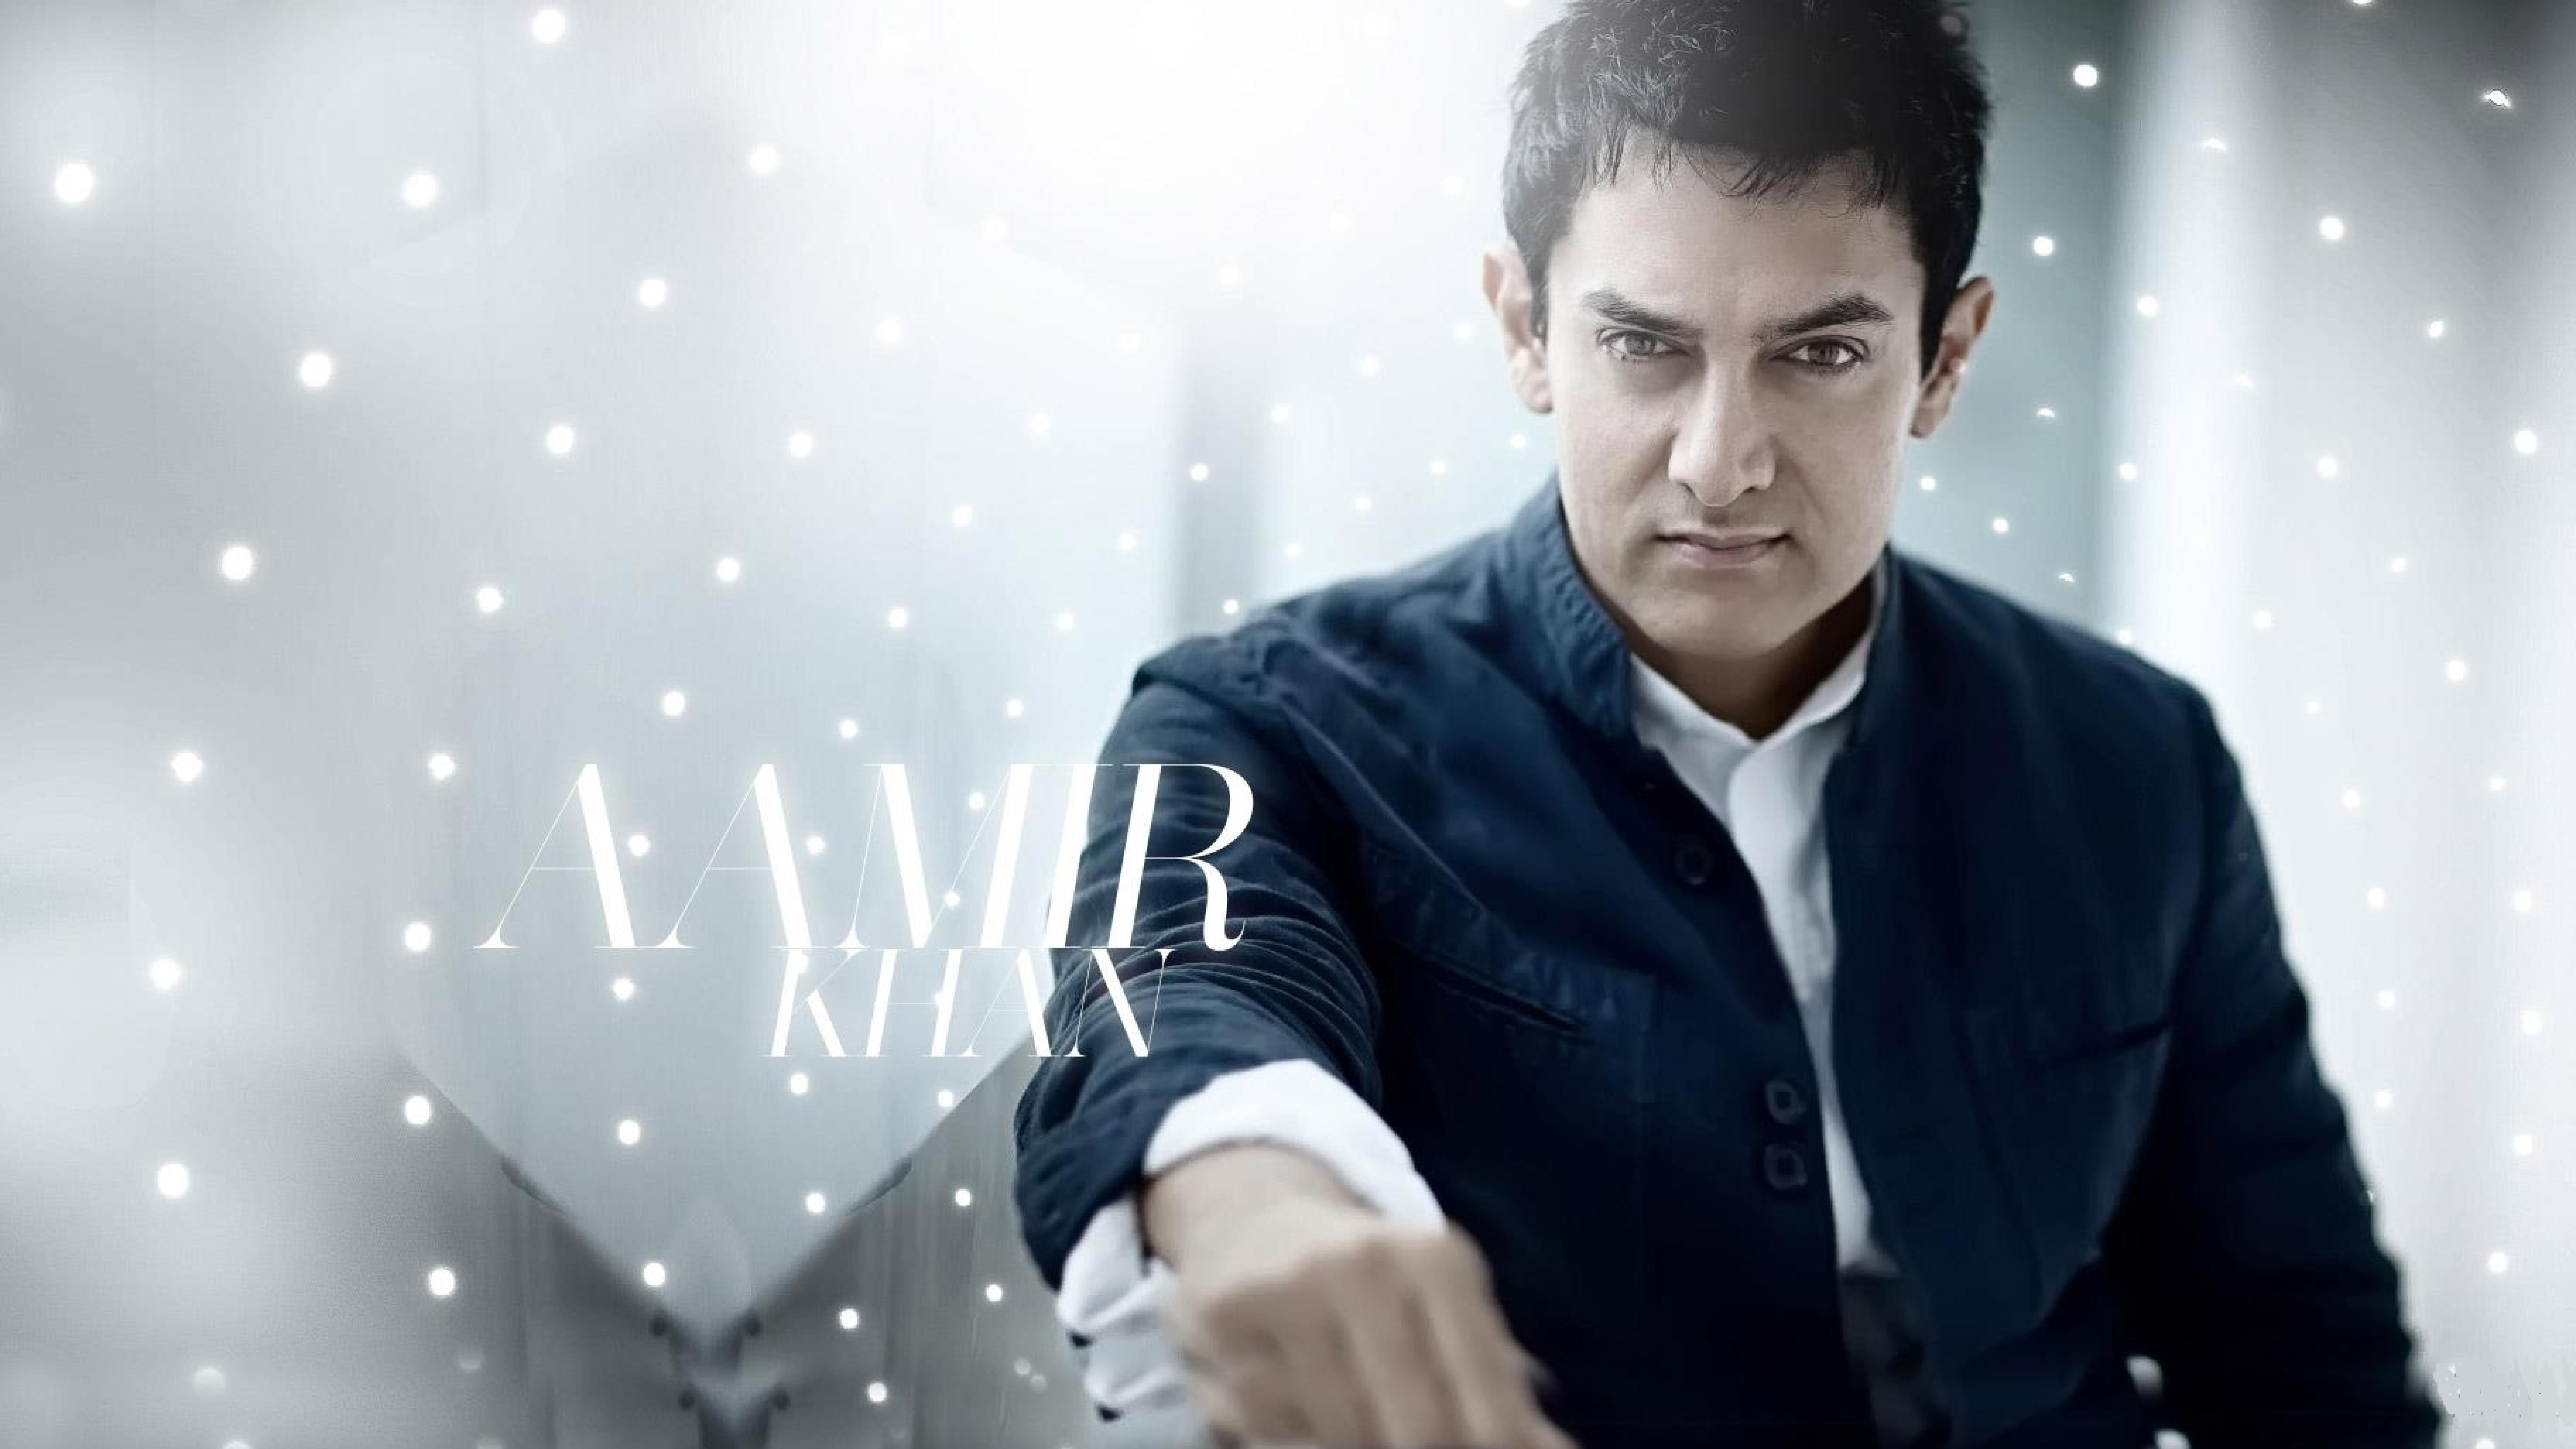 Aamir Khan Pic Download: Aamir Khan Latest Photoshoot, Full HD Wallpaper